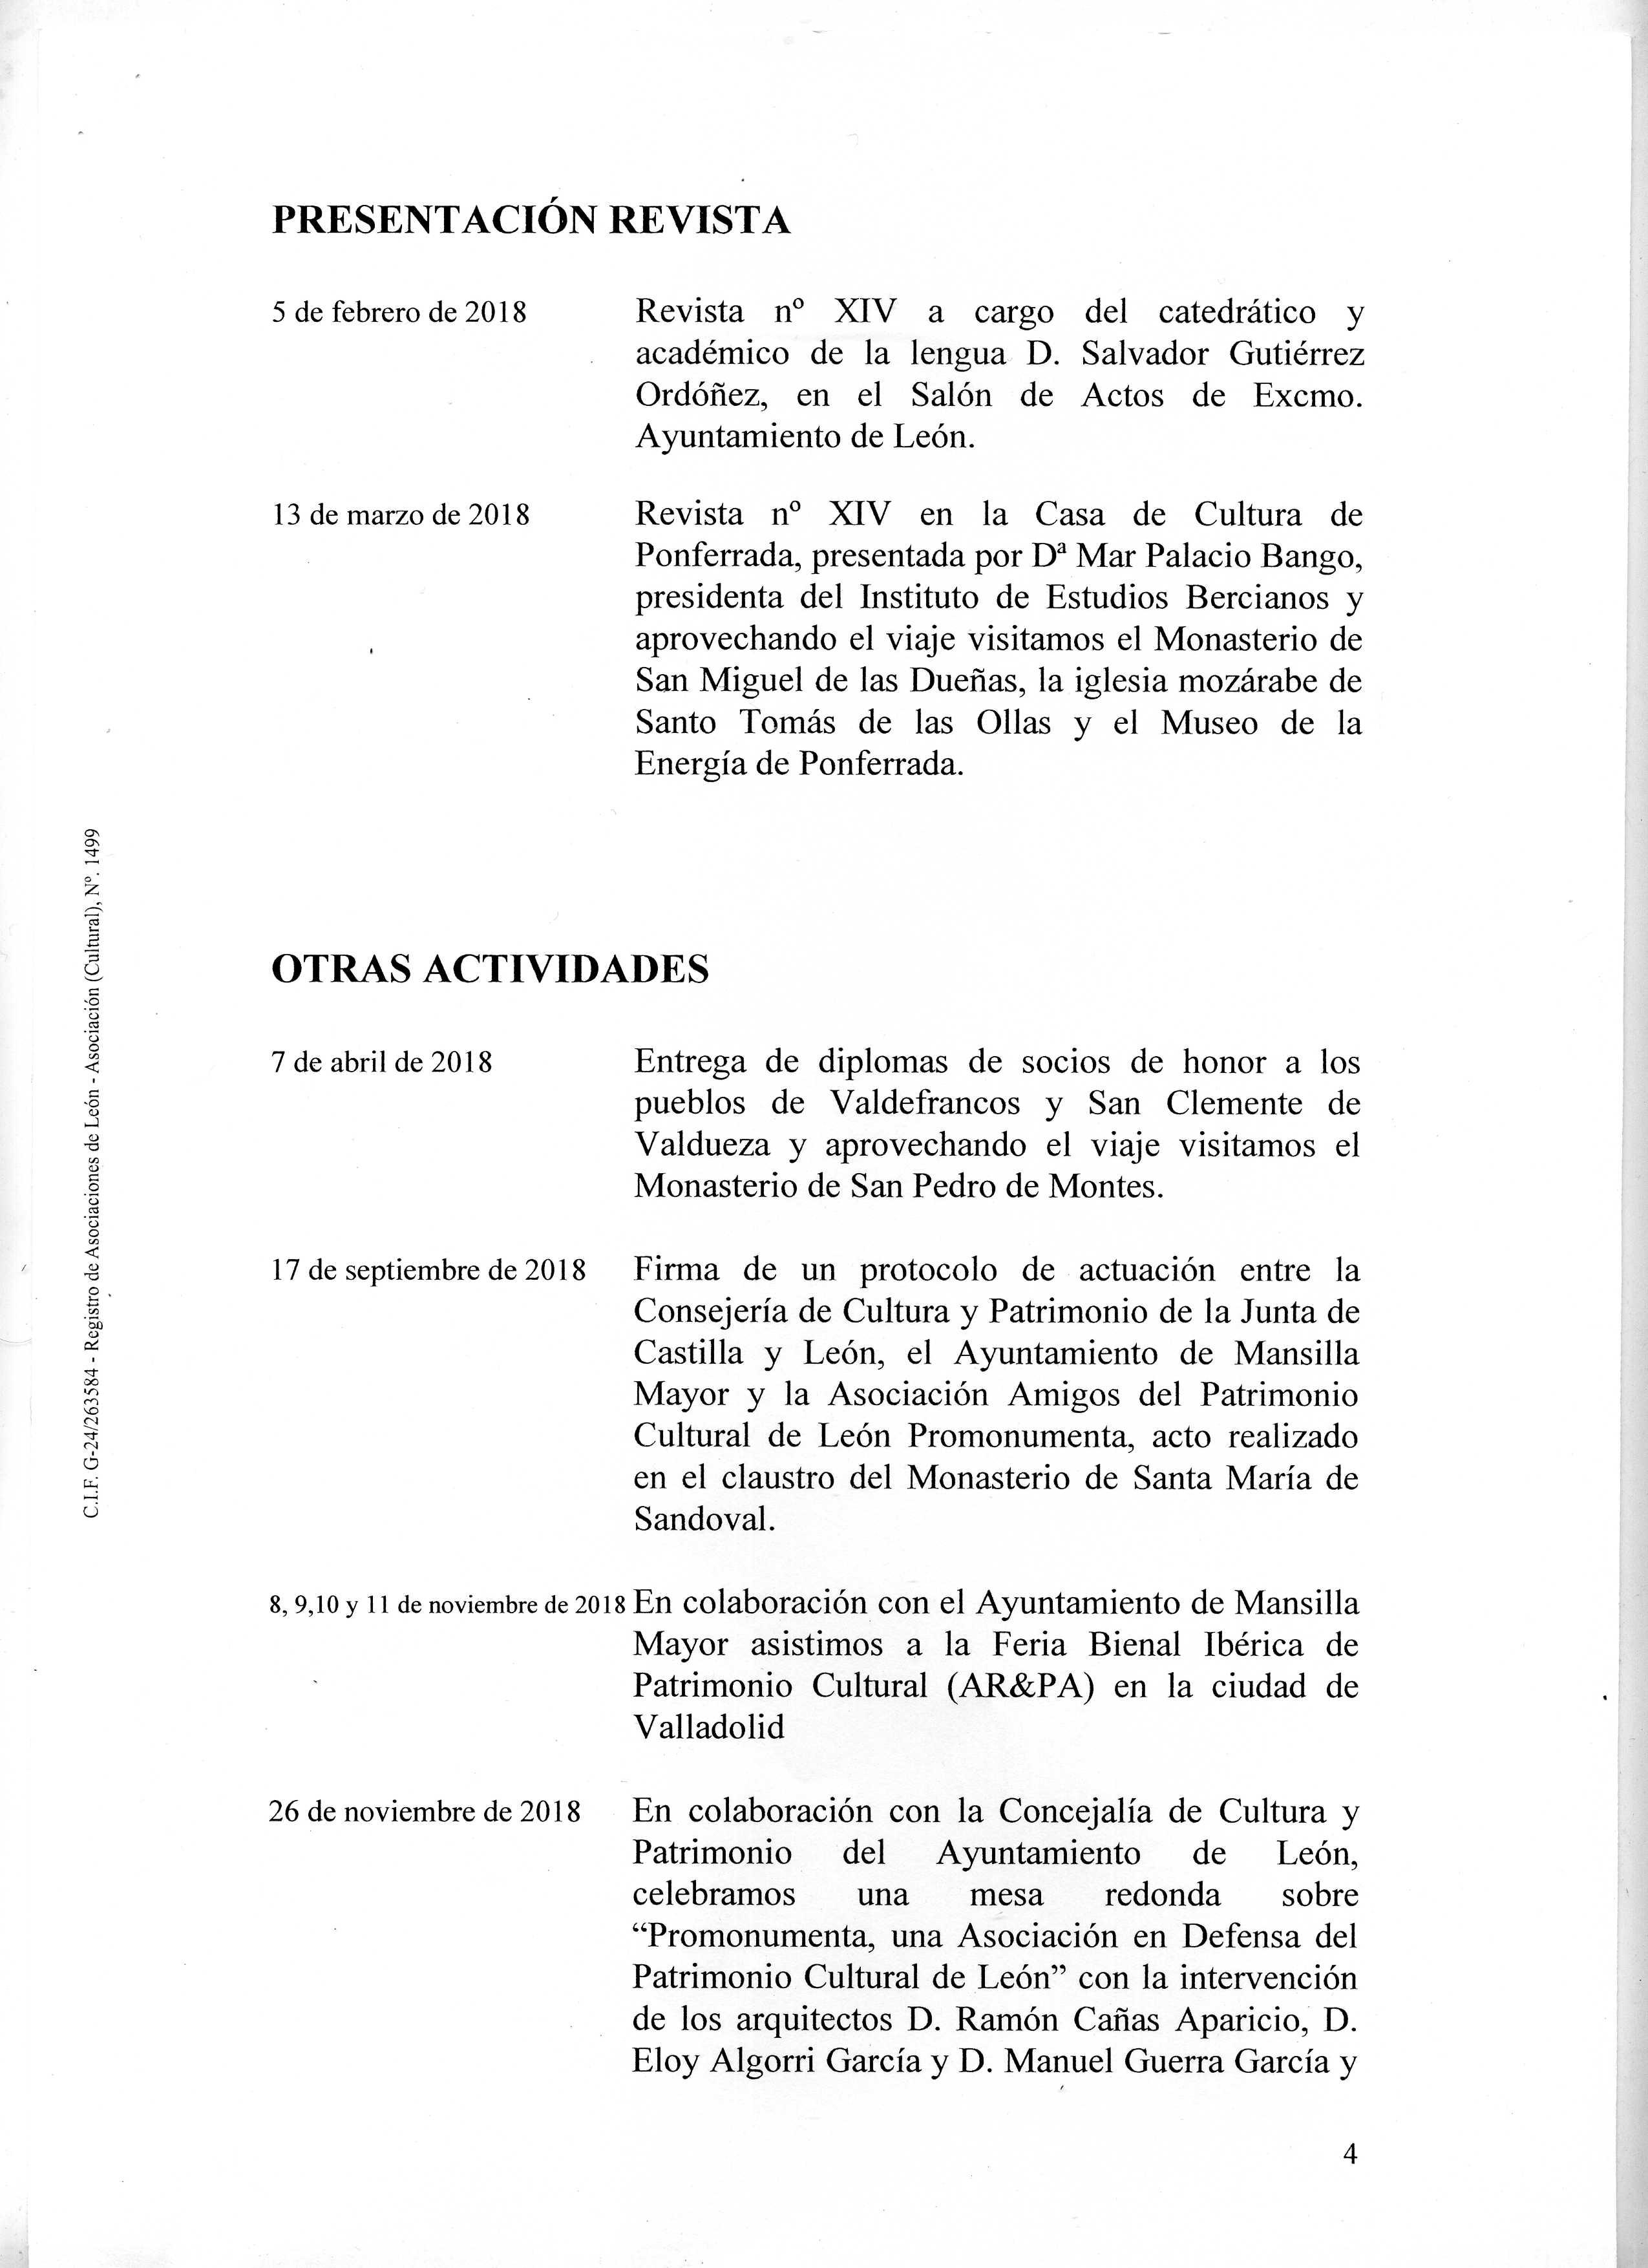 PROMONUMENTA ACTIVIDADES 2018004